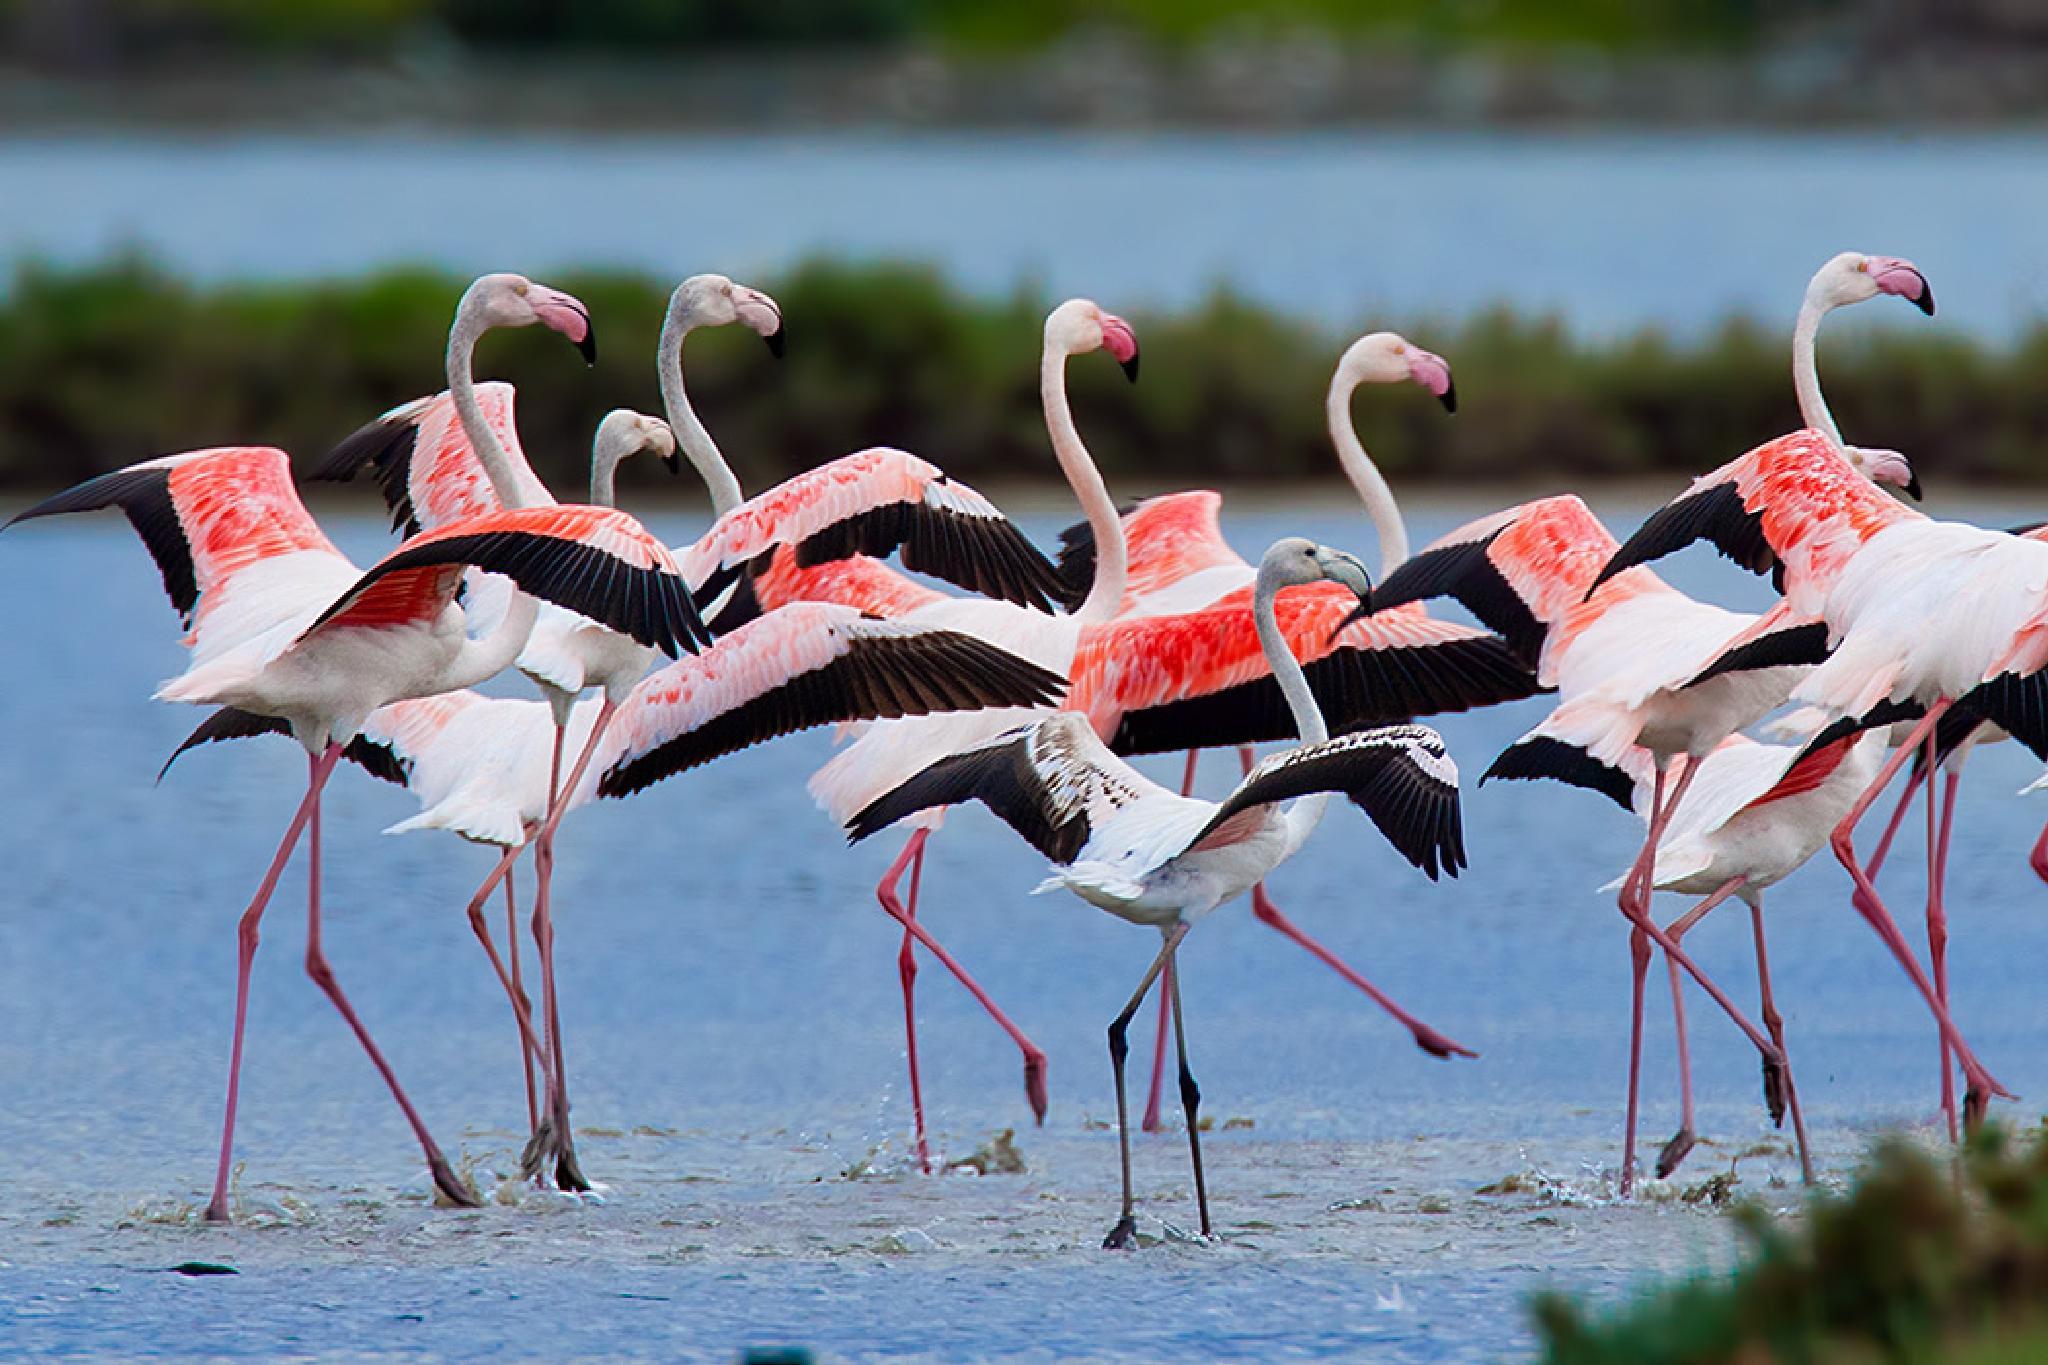 Flamingos - Love Birds by Sotiris Siomis